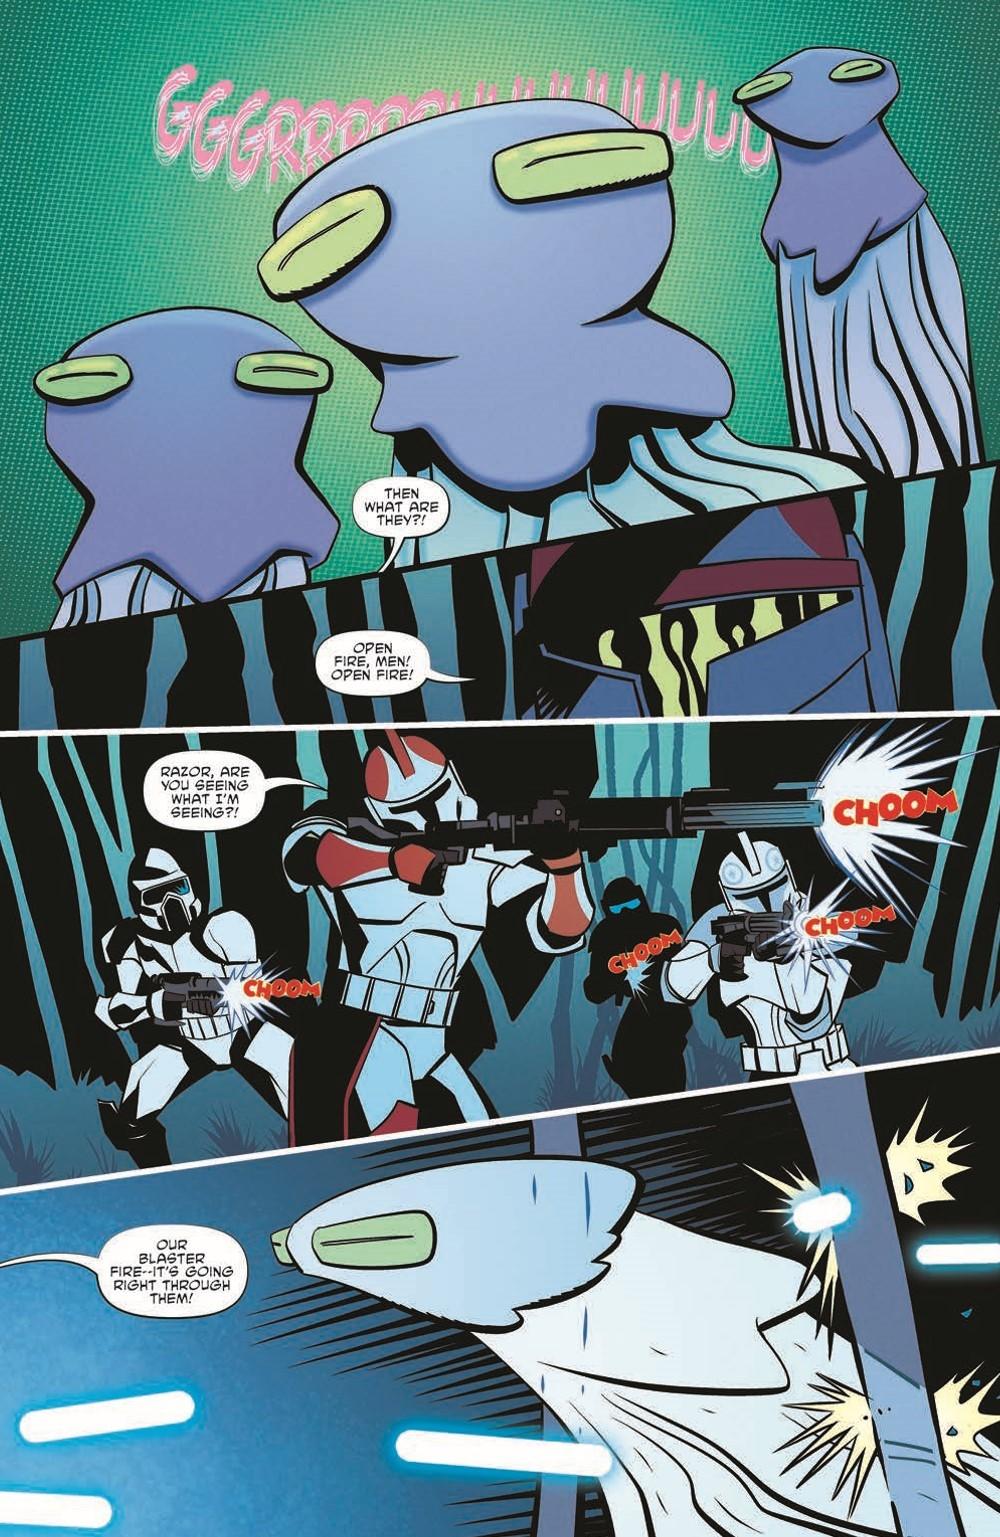 StarWarsAdv09-pr-7 ComicList Previews: STAR WARS ADVENTURES VOLUME 2 #9